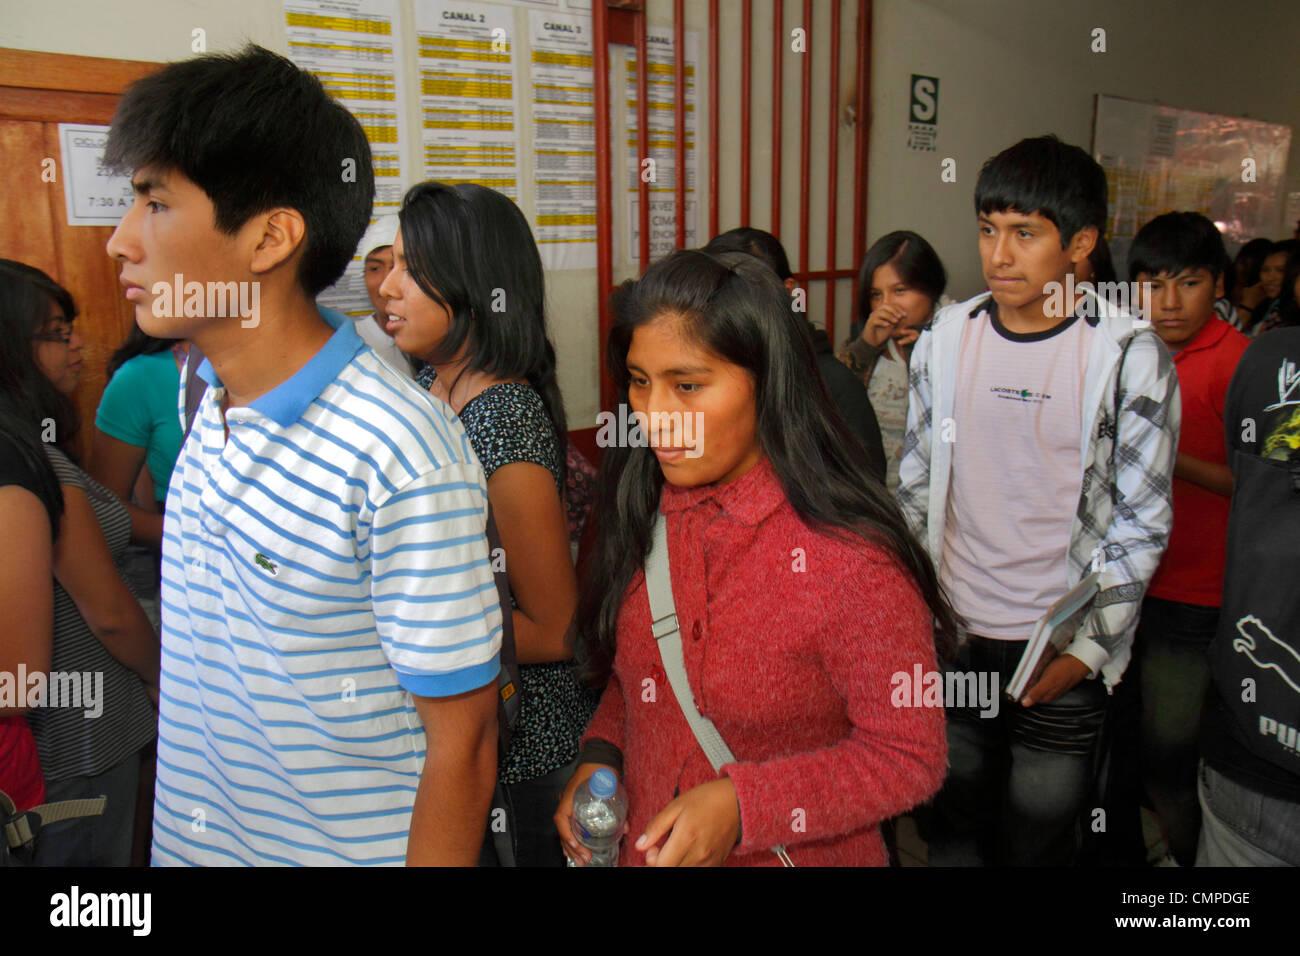 Peru Tacna Calle Hipólito Unanue CIMA Academia PreUniversitaria university preparatory school secondary education - Stock Image